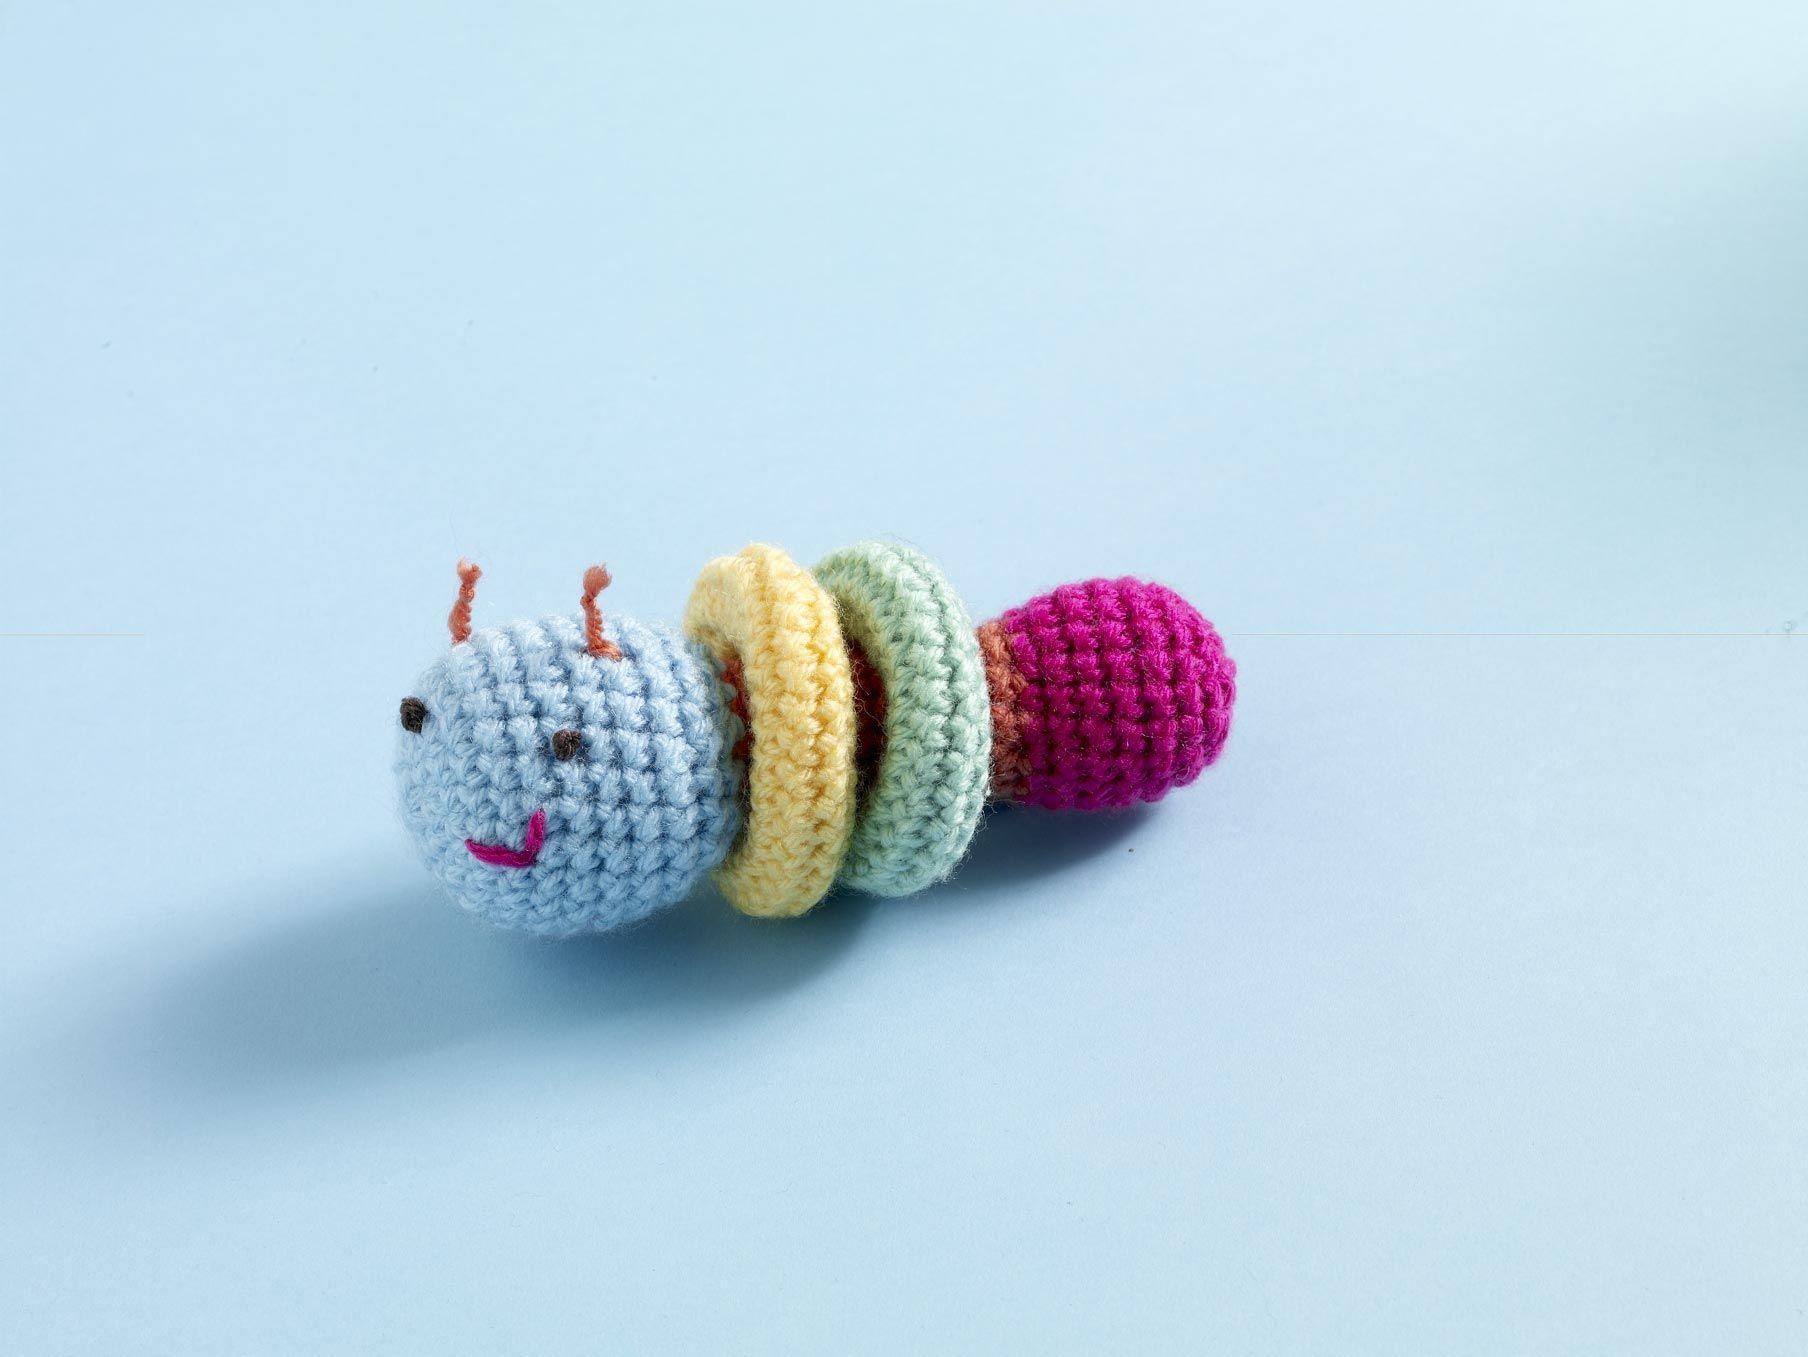 crochet caterpillar toy | have yarn . . . will crochet | Pinterest ...